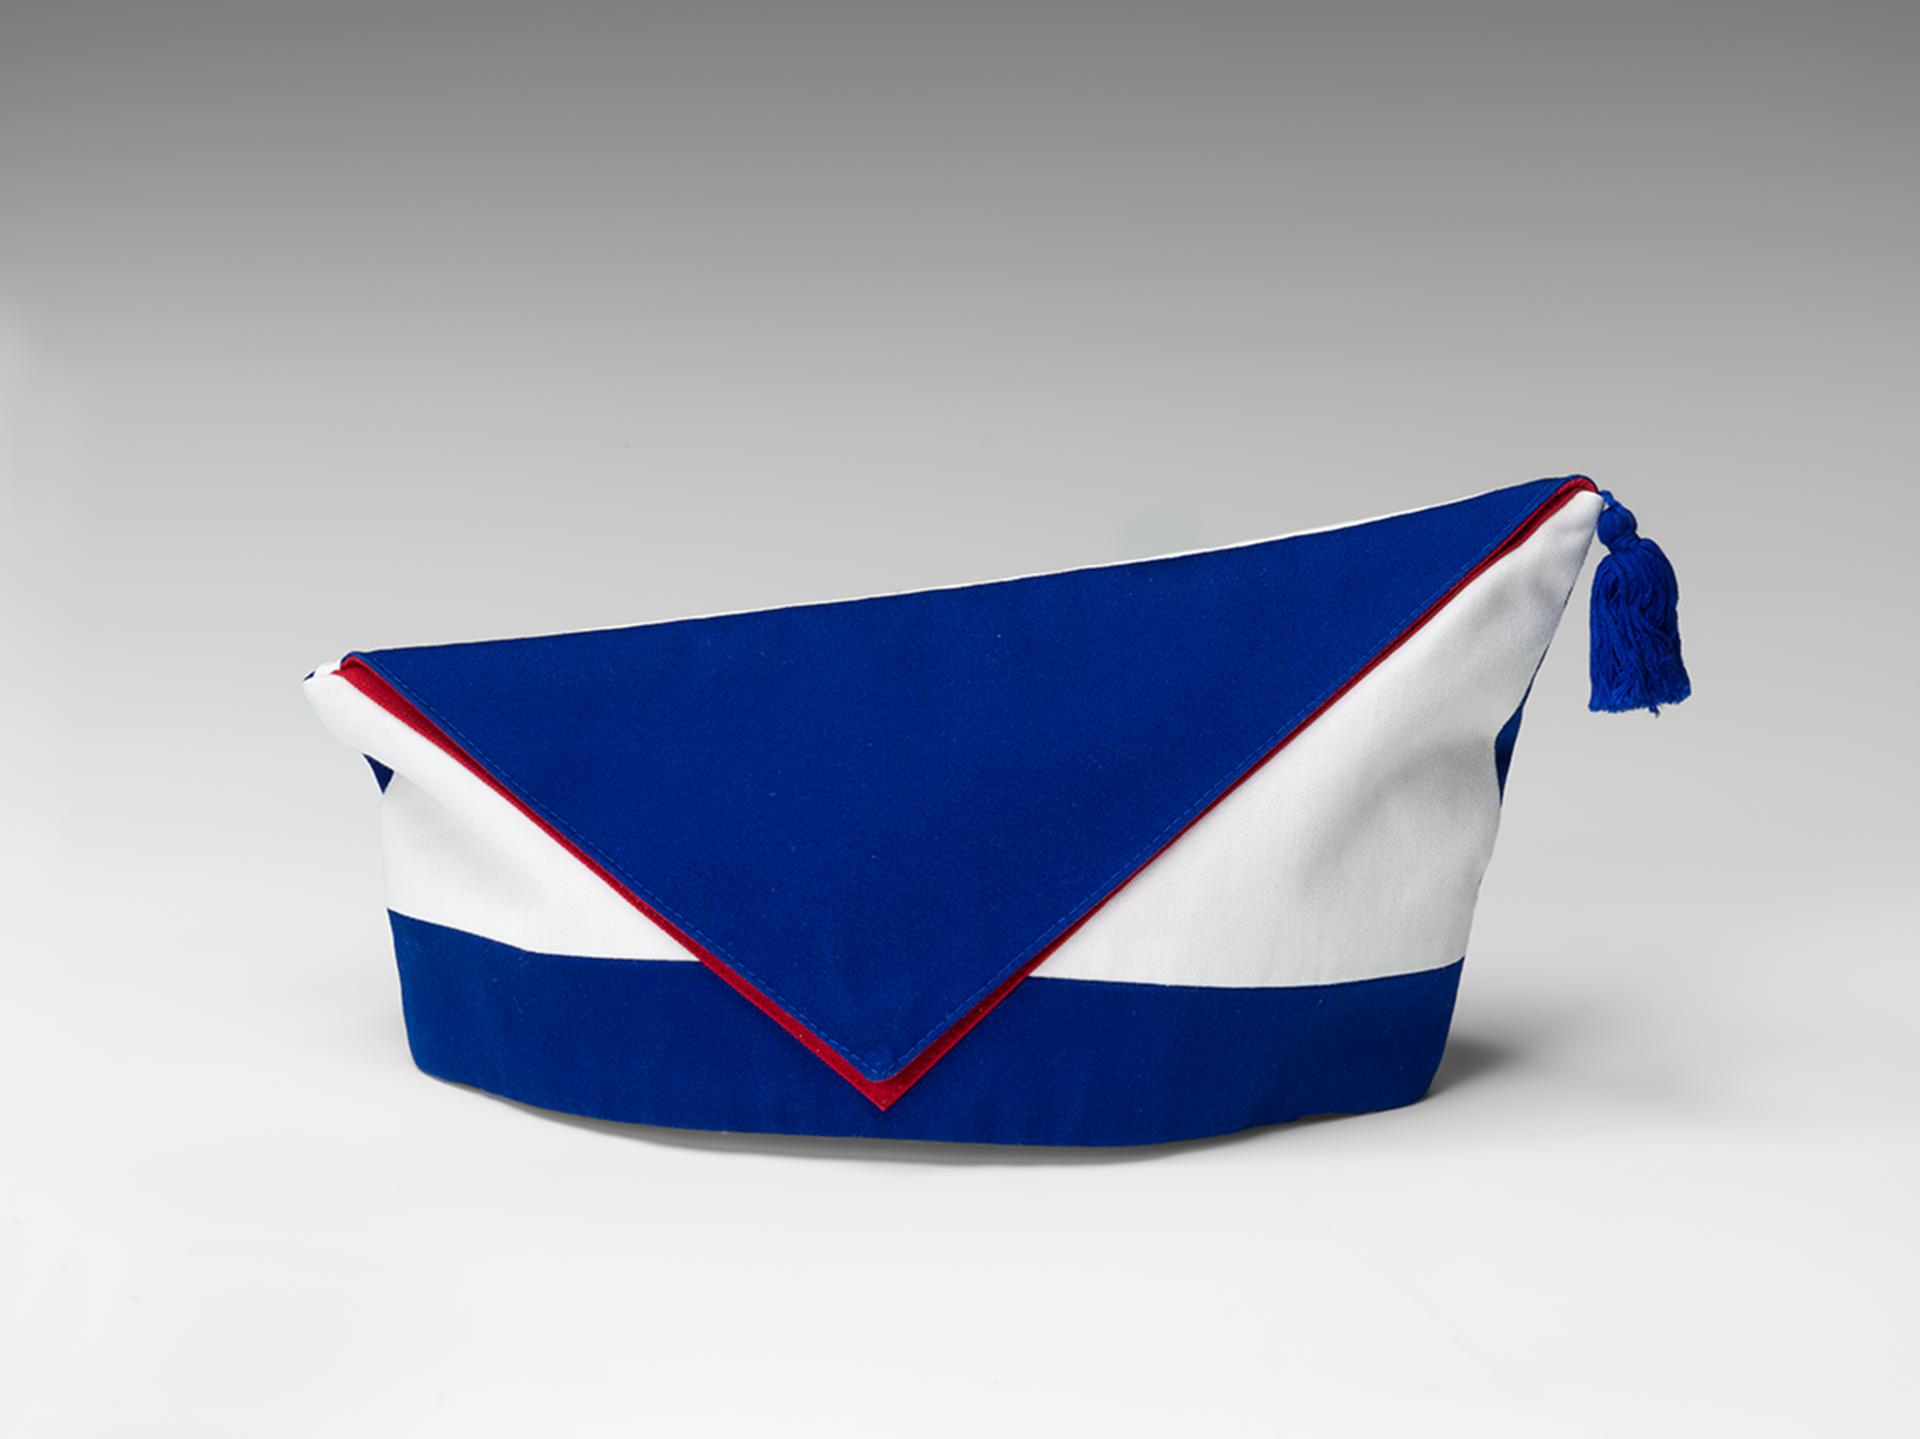 Handgefertigtes blau-weiß-rotes Krätzchen (Gesellschaftsmütze bzw. Narrenkappe) des jüdischen Karnevalsvereins Köllsche Kippa Köpp e.V.